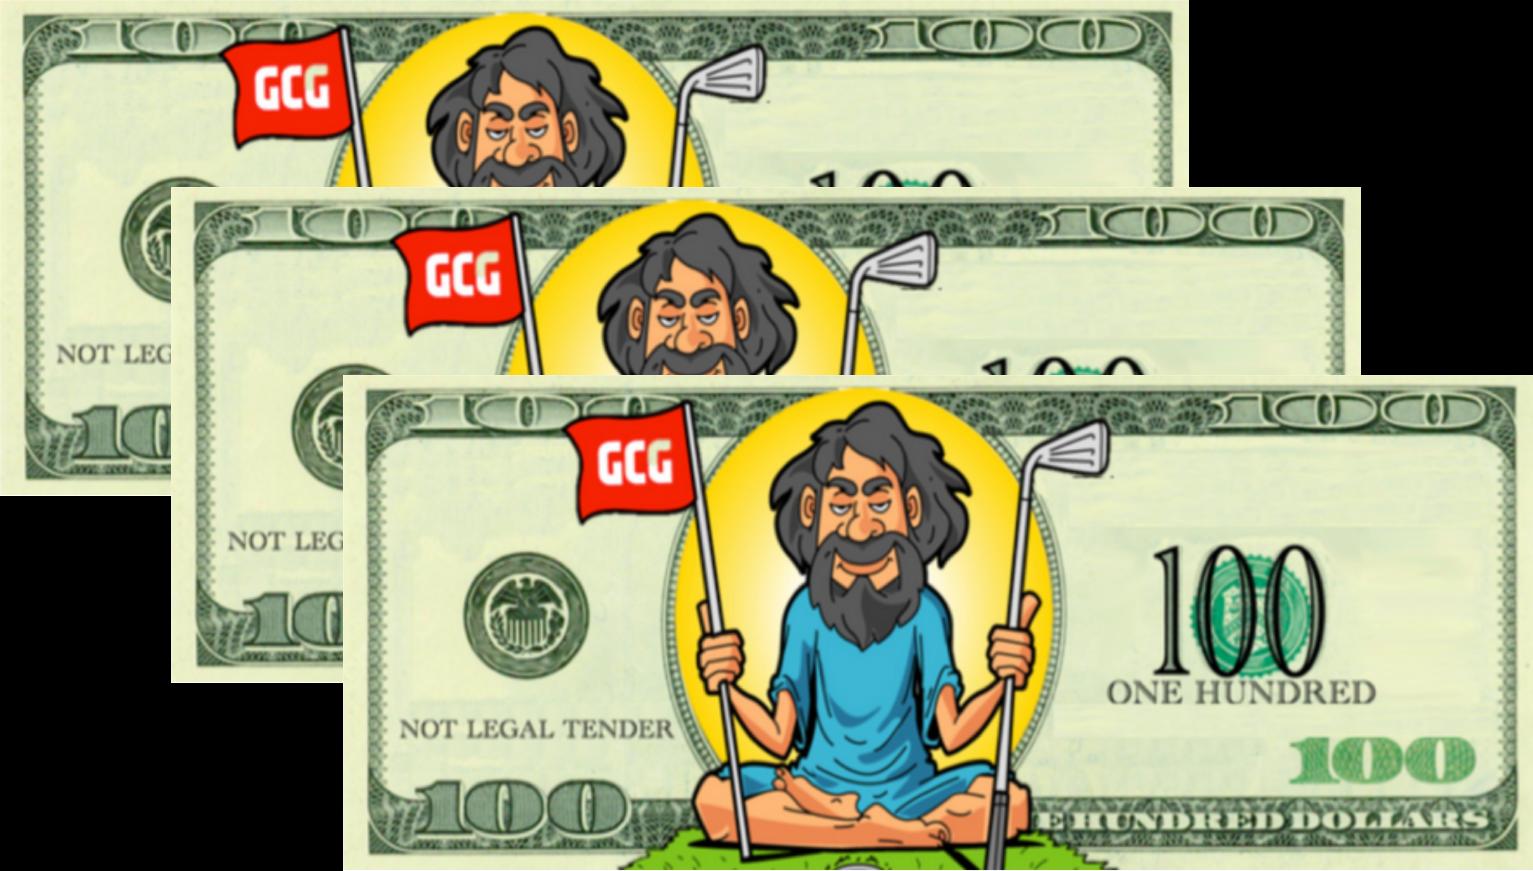 $200 - $300